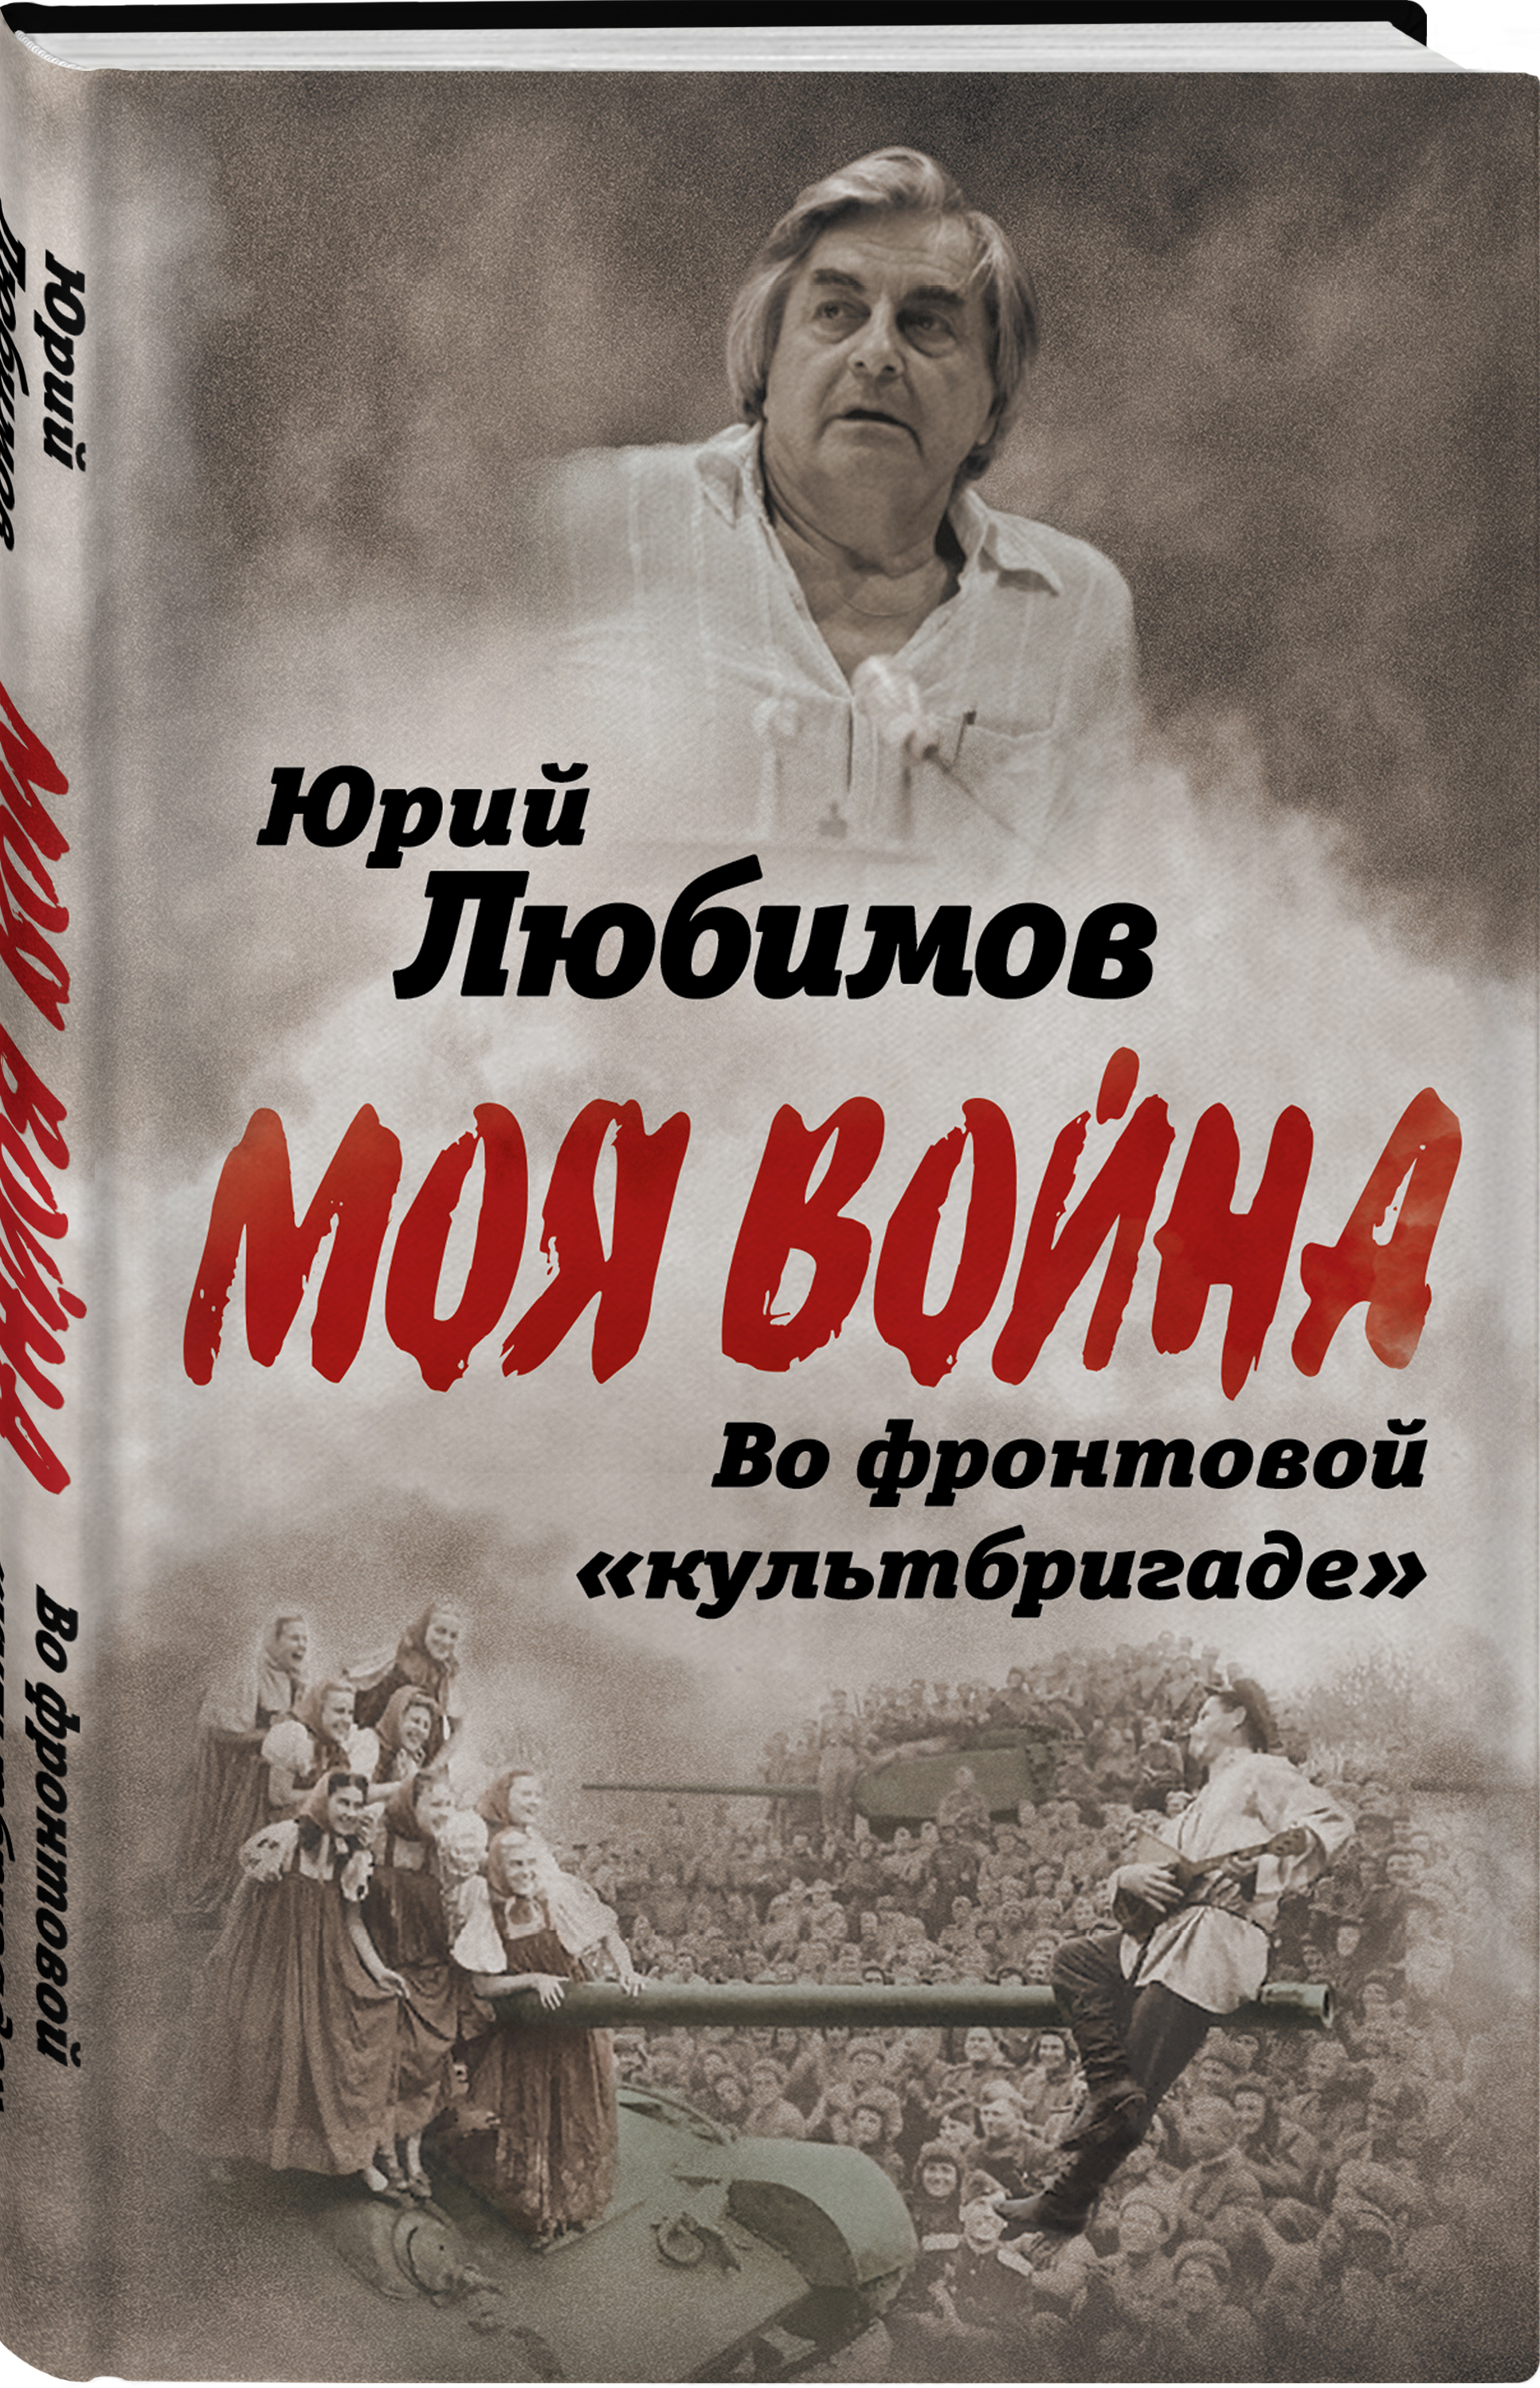 Юрий Любимов Во фронтовой «культбригаде»